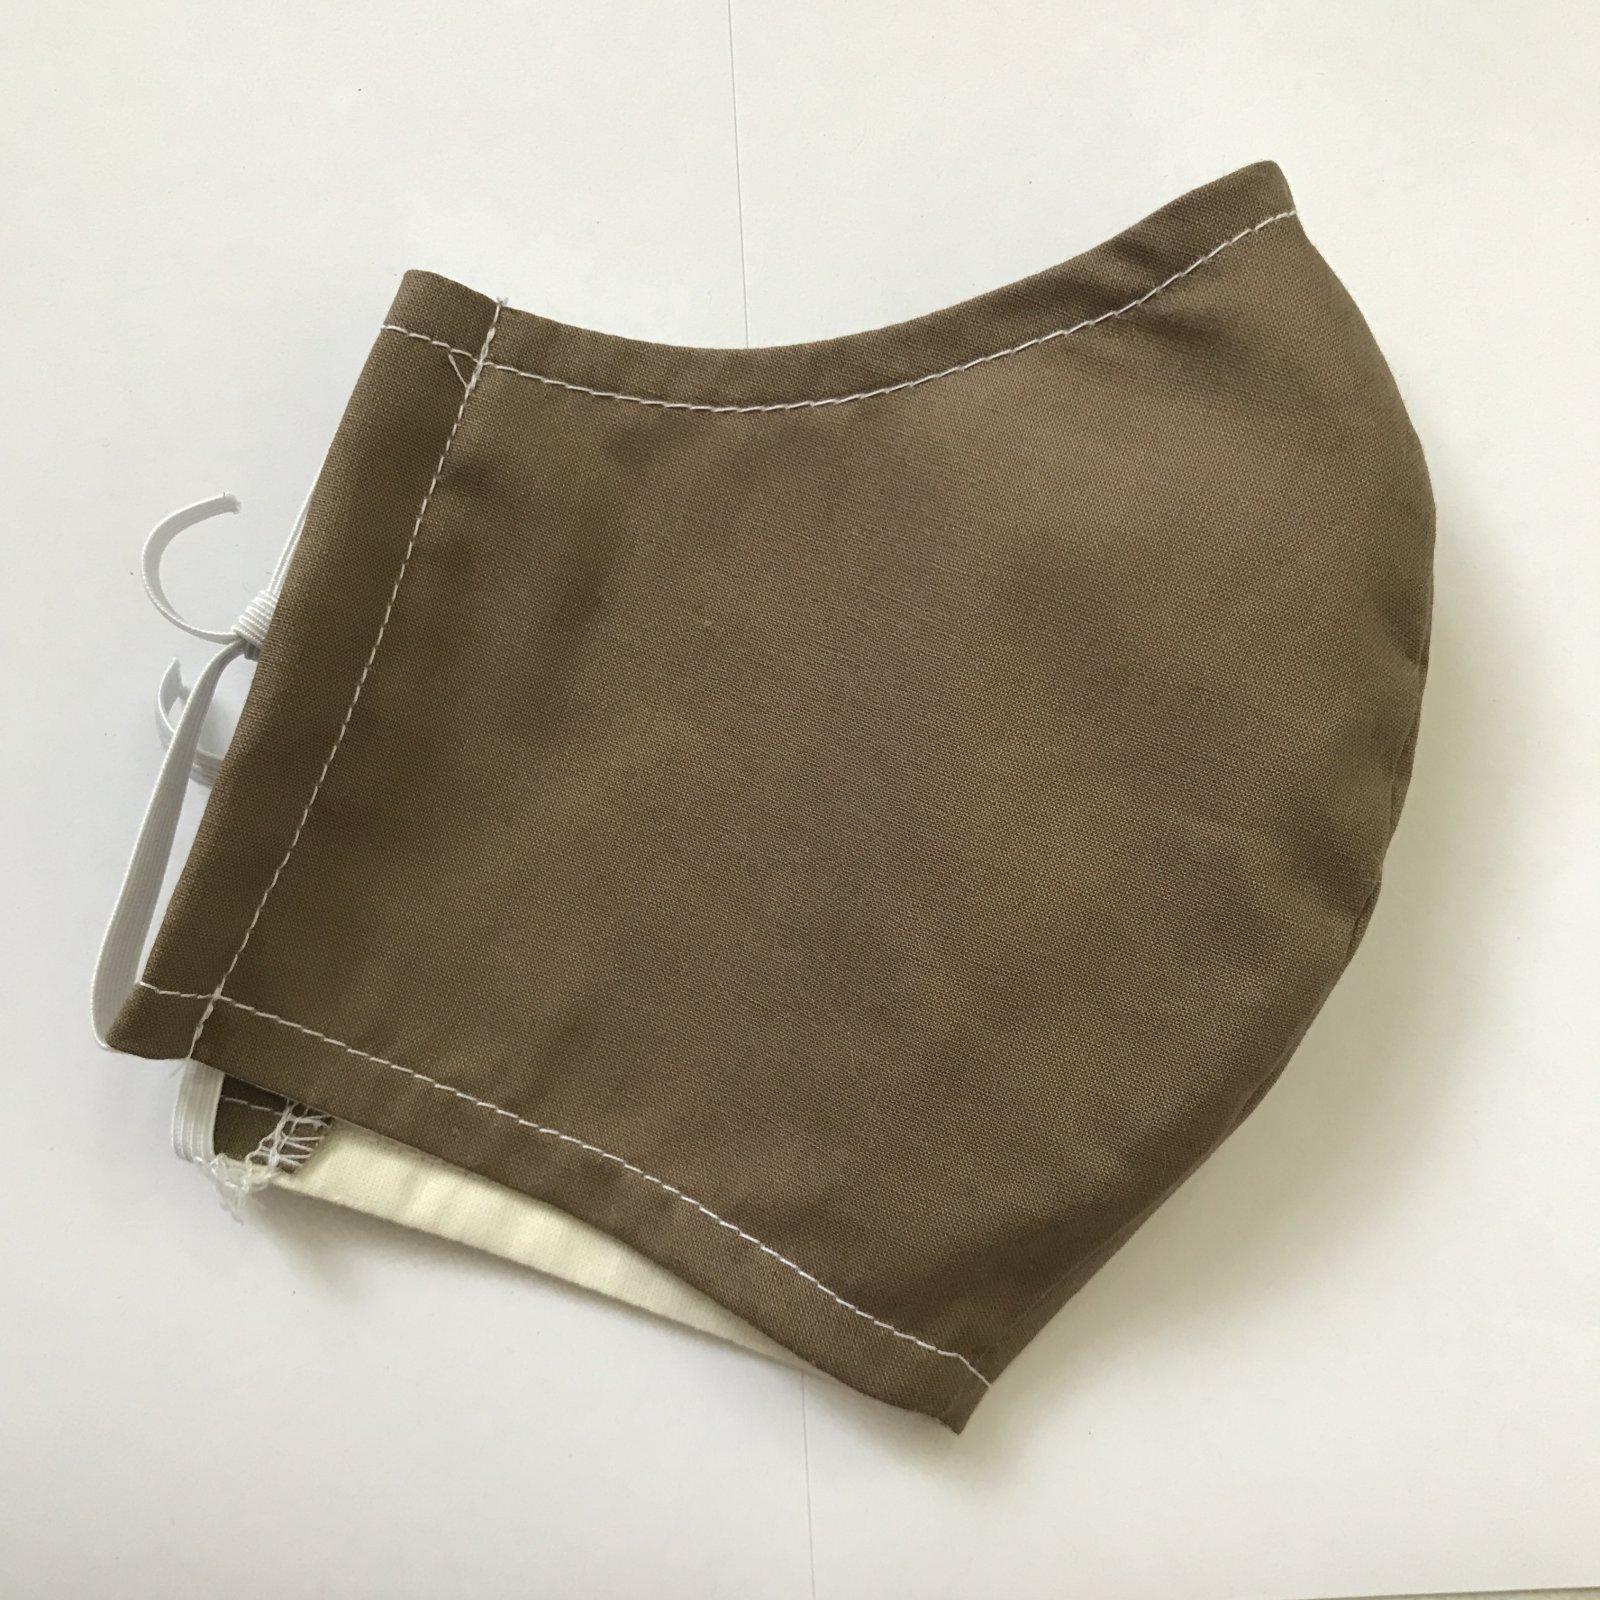 Adult Size Contoured Cotton Elastic Mask - Brown